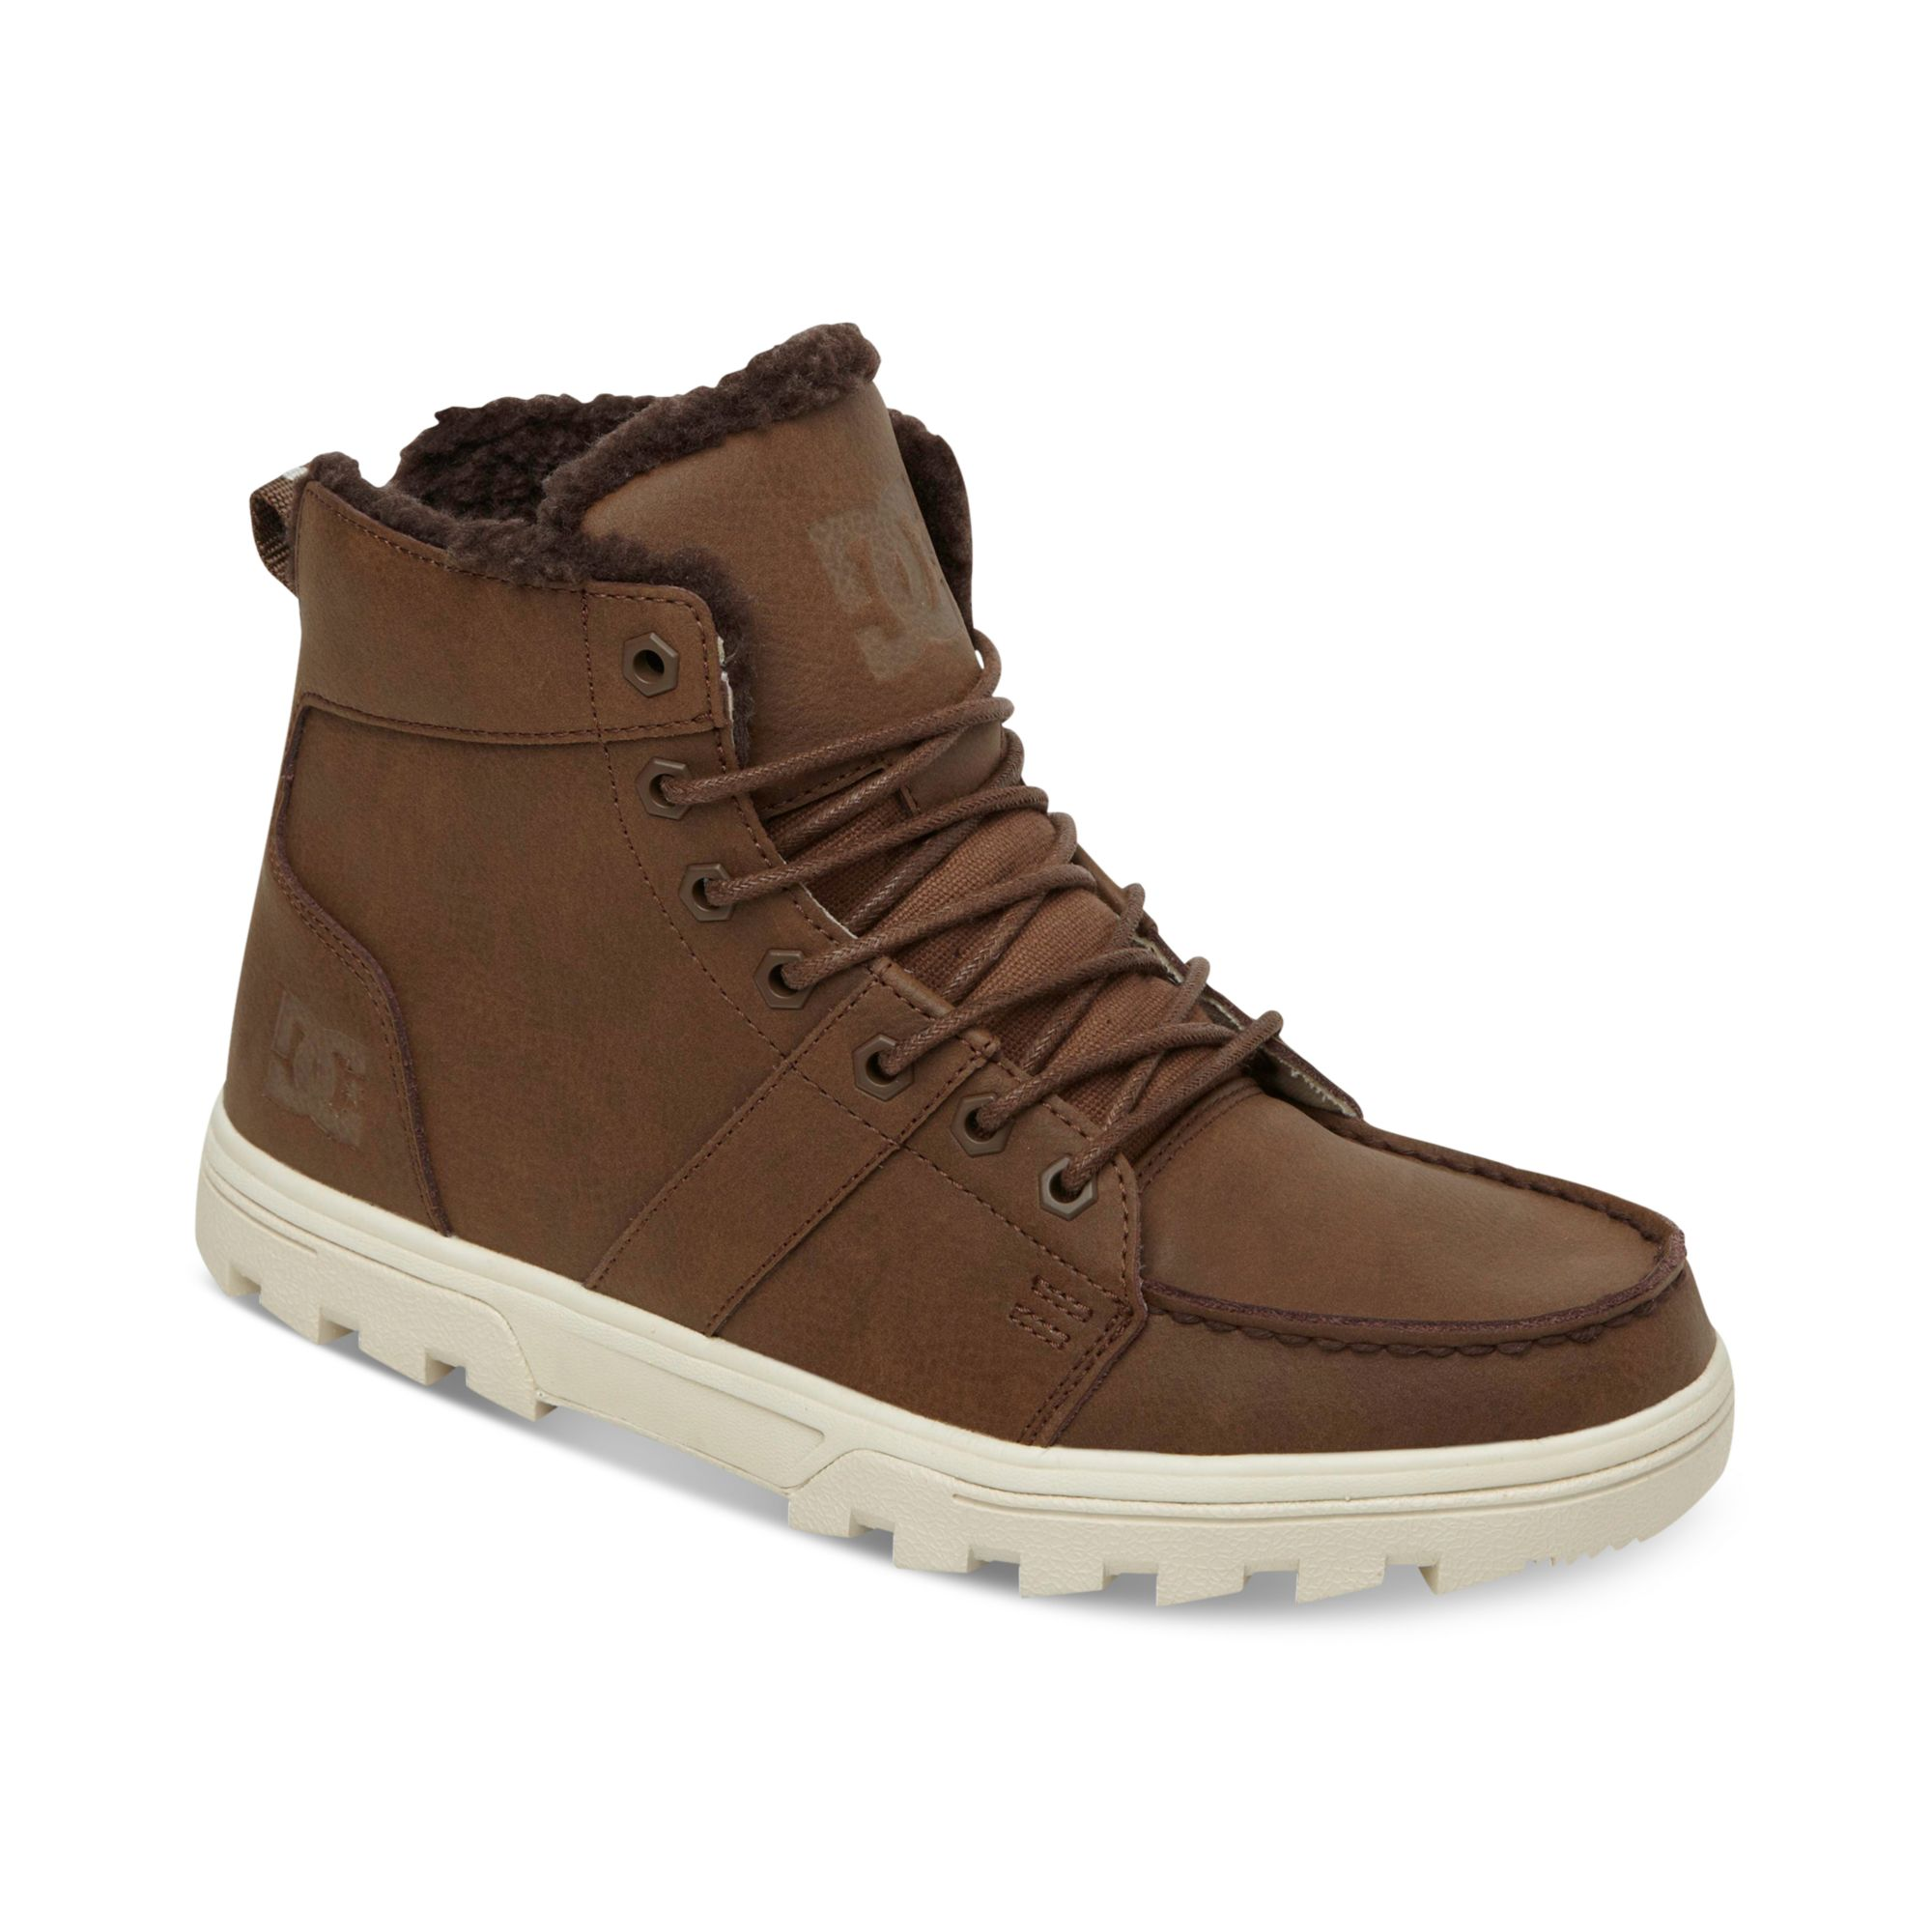 Woodland New Shoes